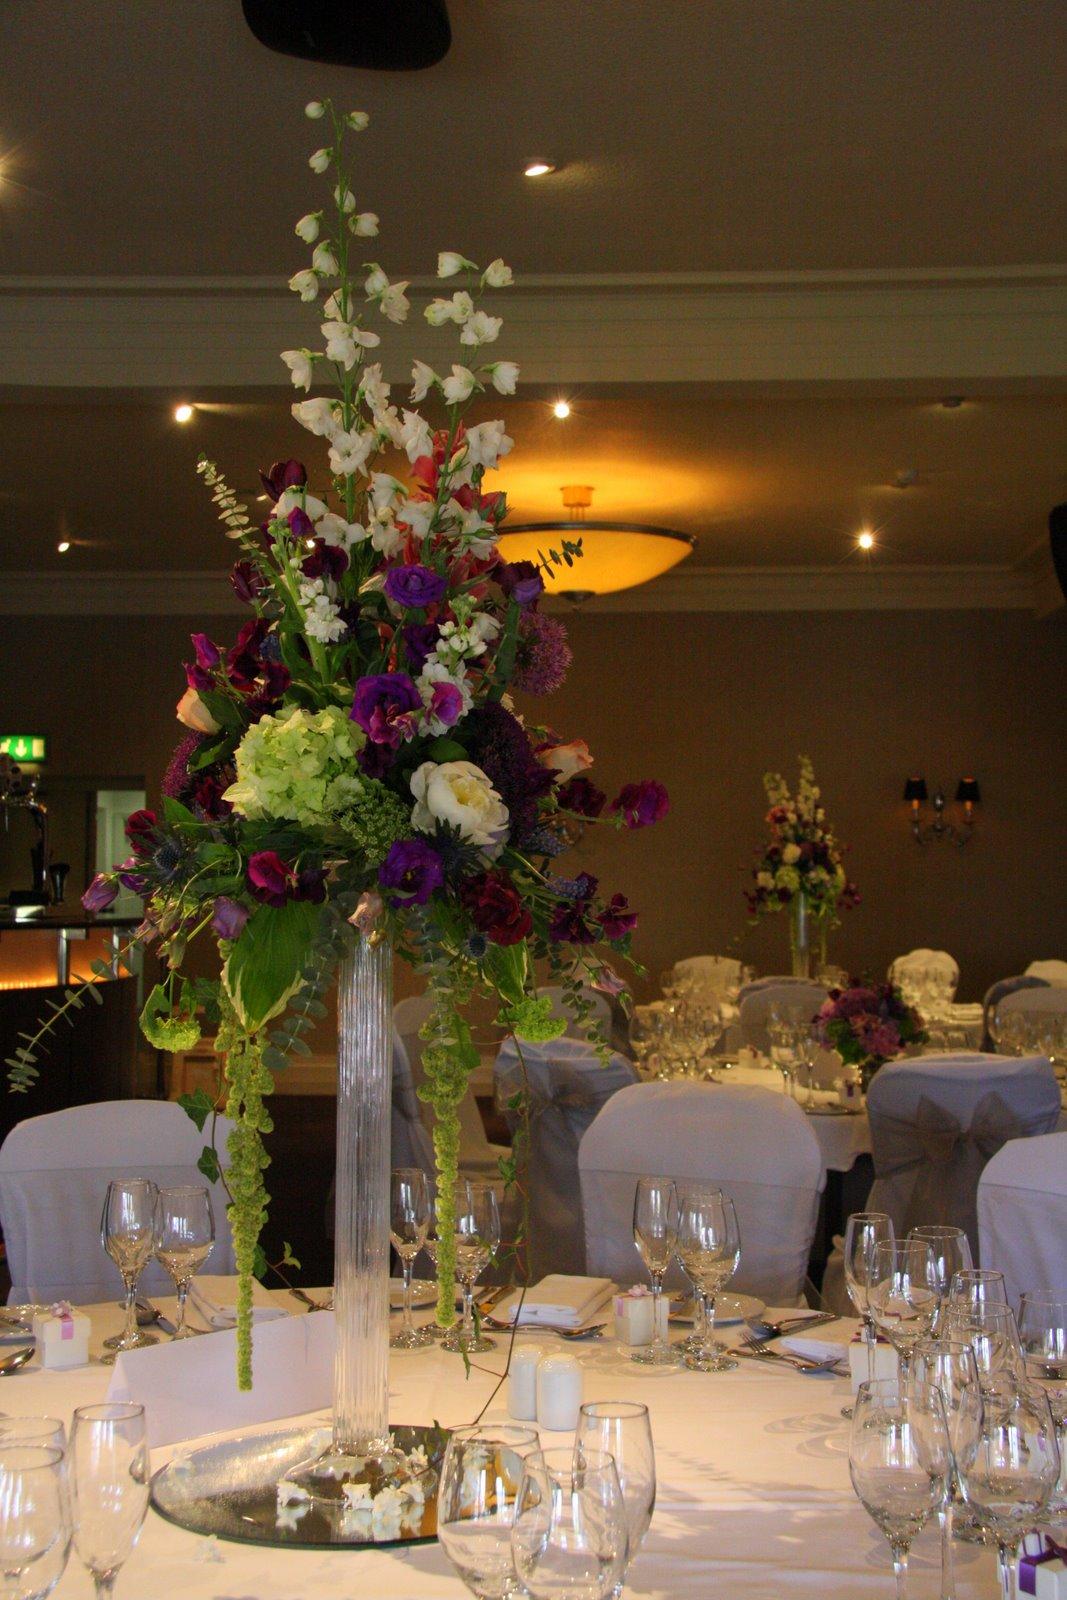 Flower design table centrepieces glass candlestick table for Black table centrepieces